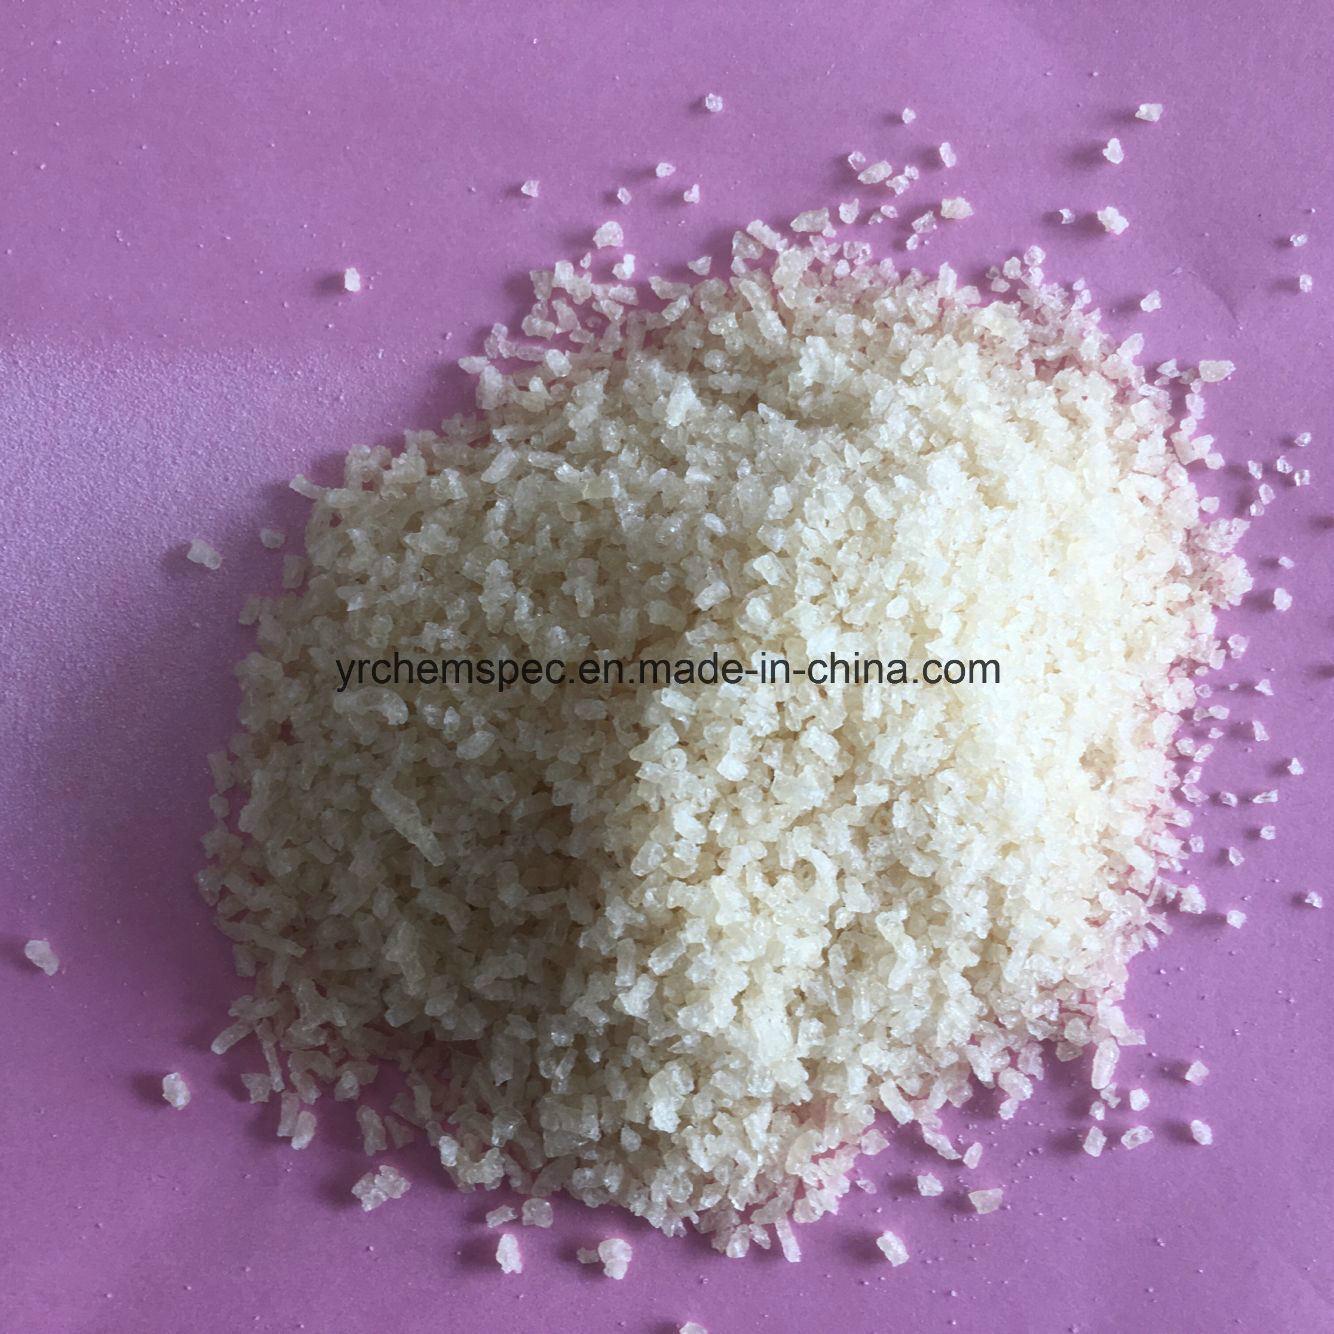 Cosmetic Grade Biochemical Additive Gelatin